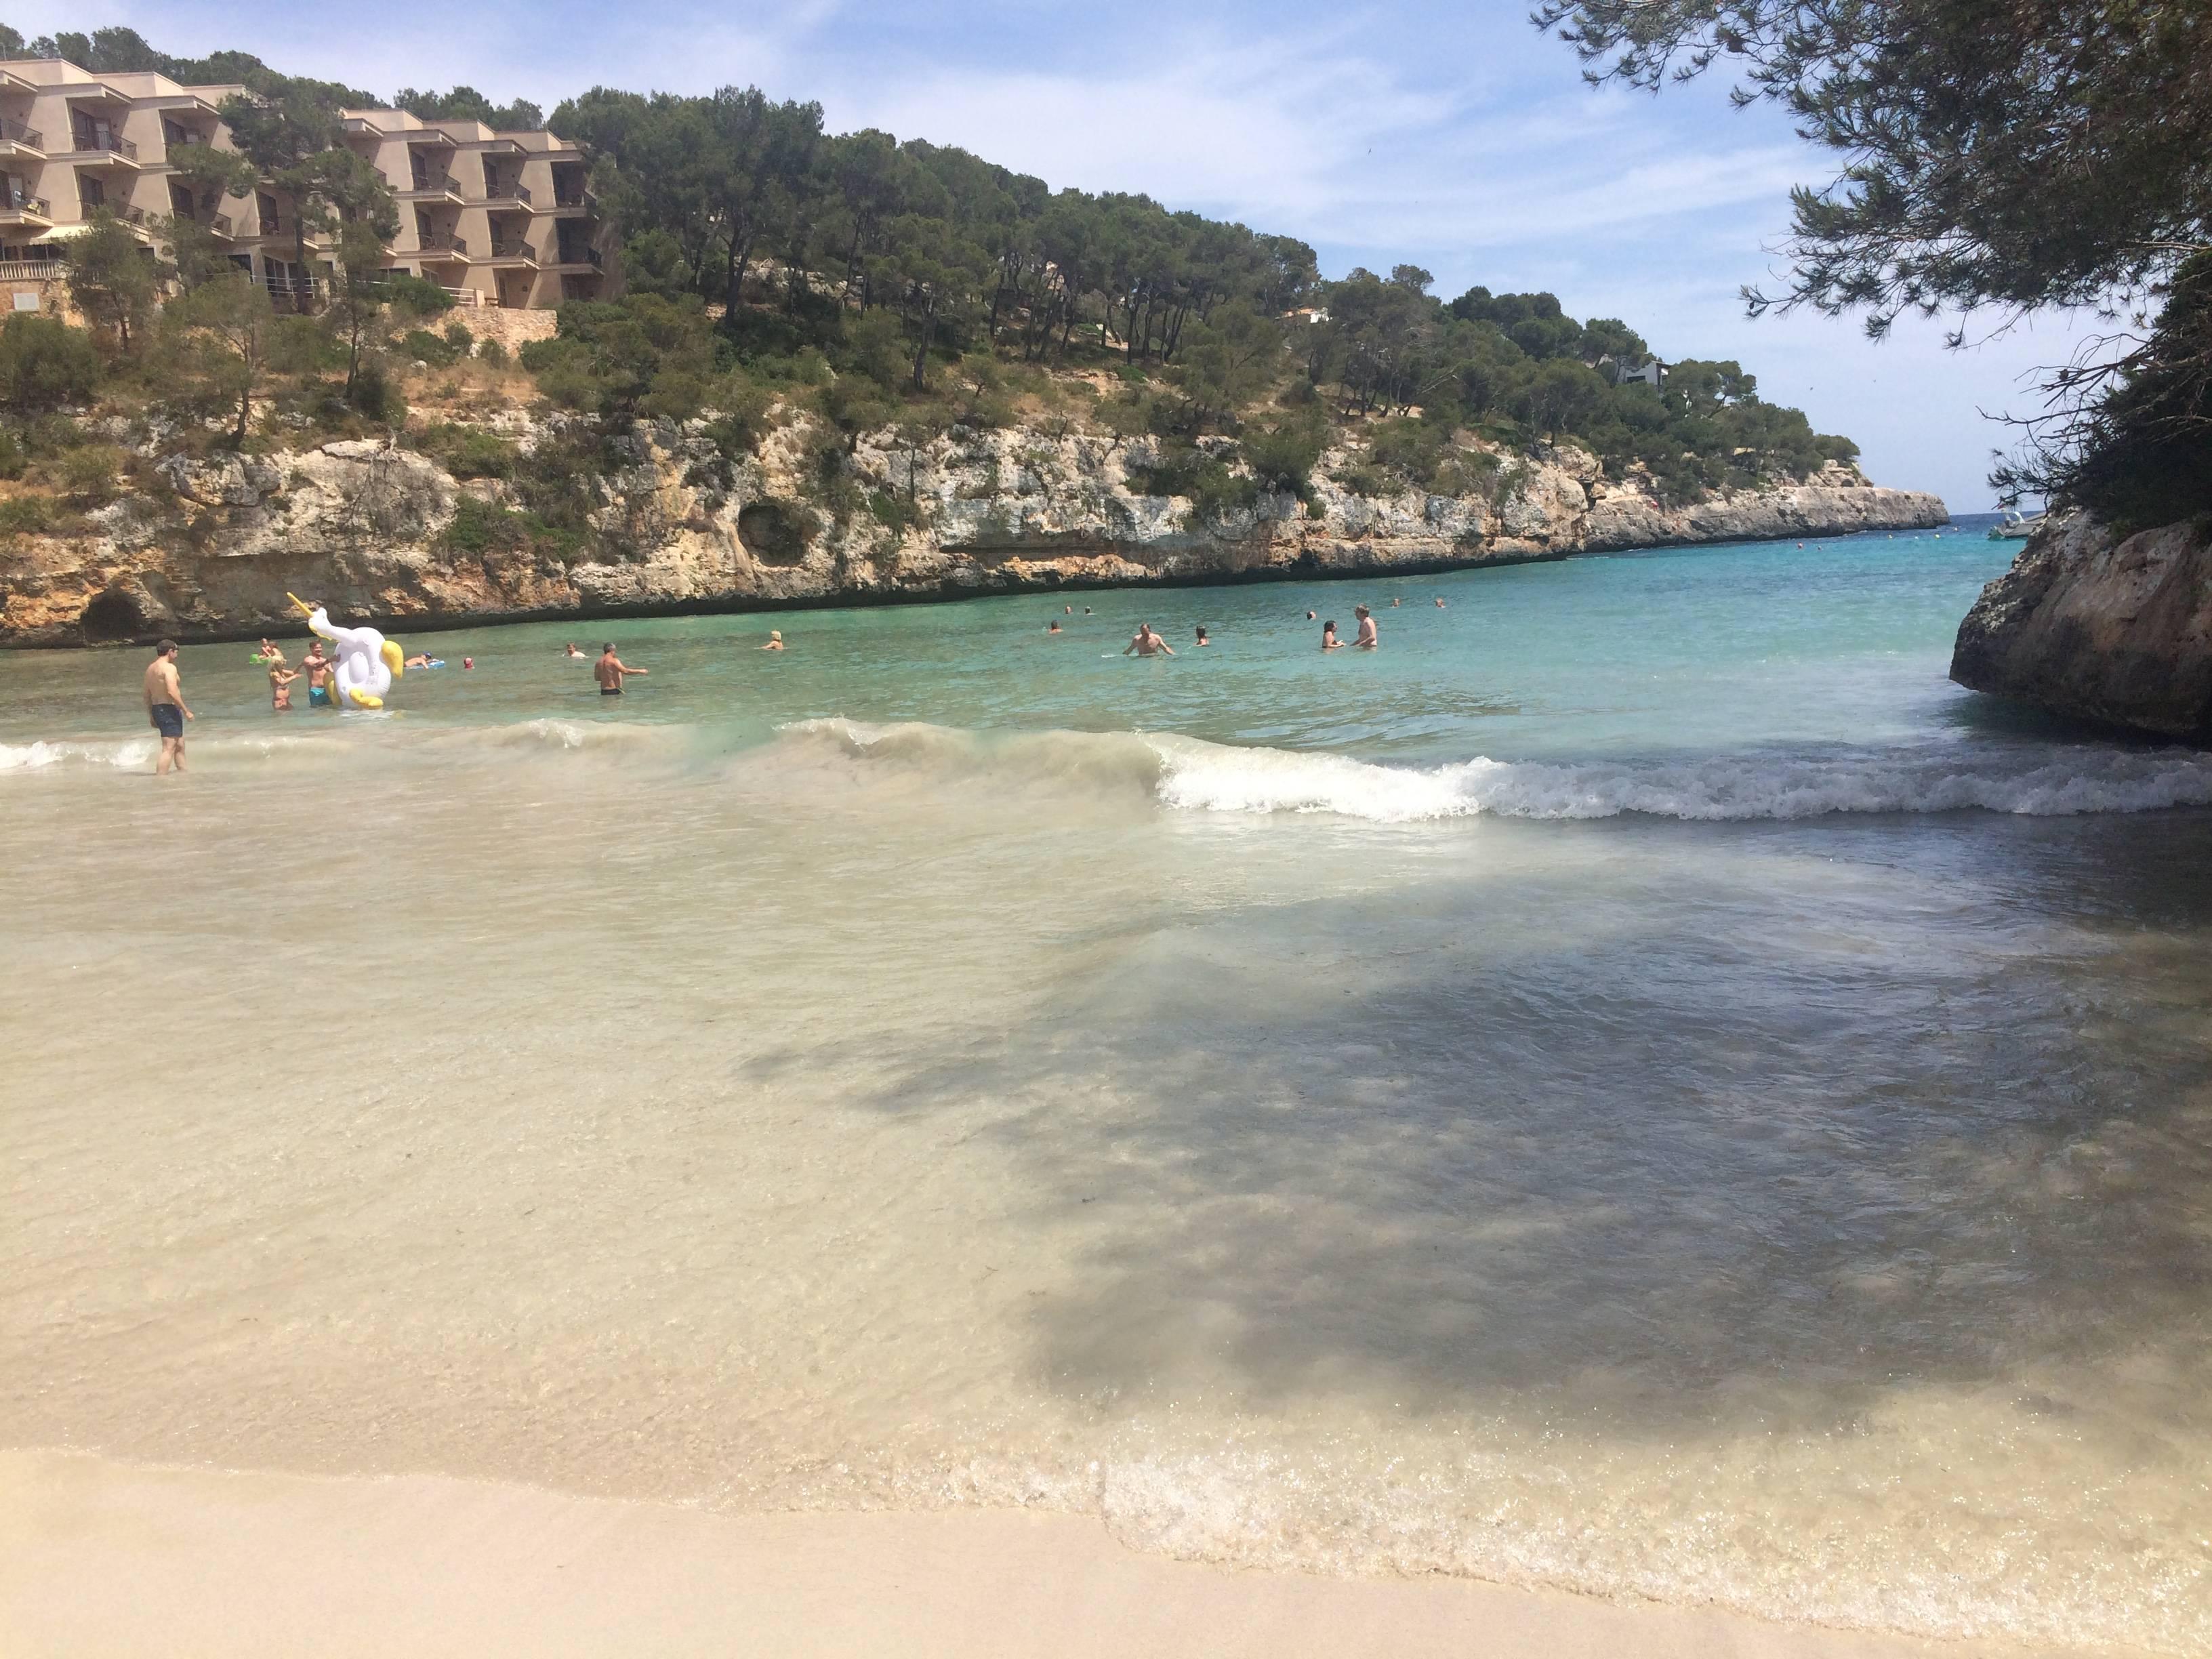 Photo 1: Cala Santanyì, Mallorca